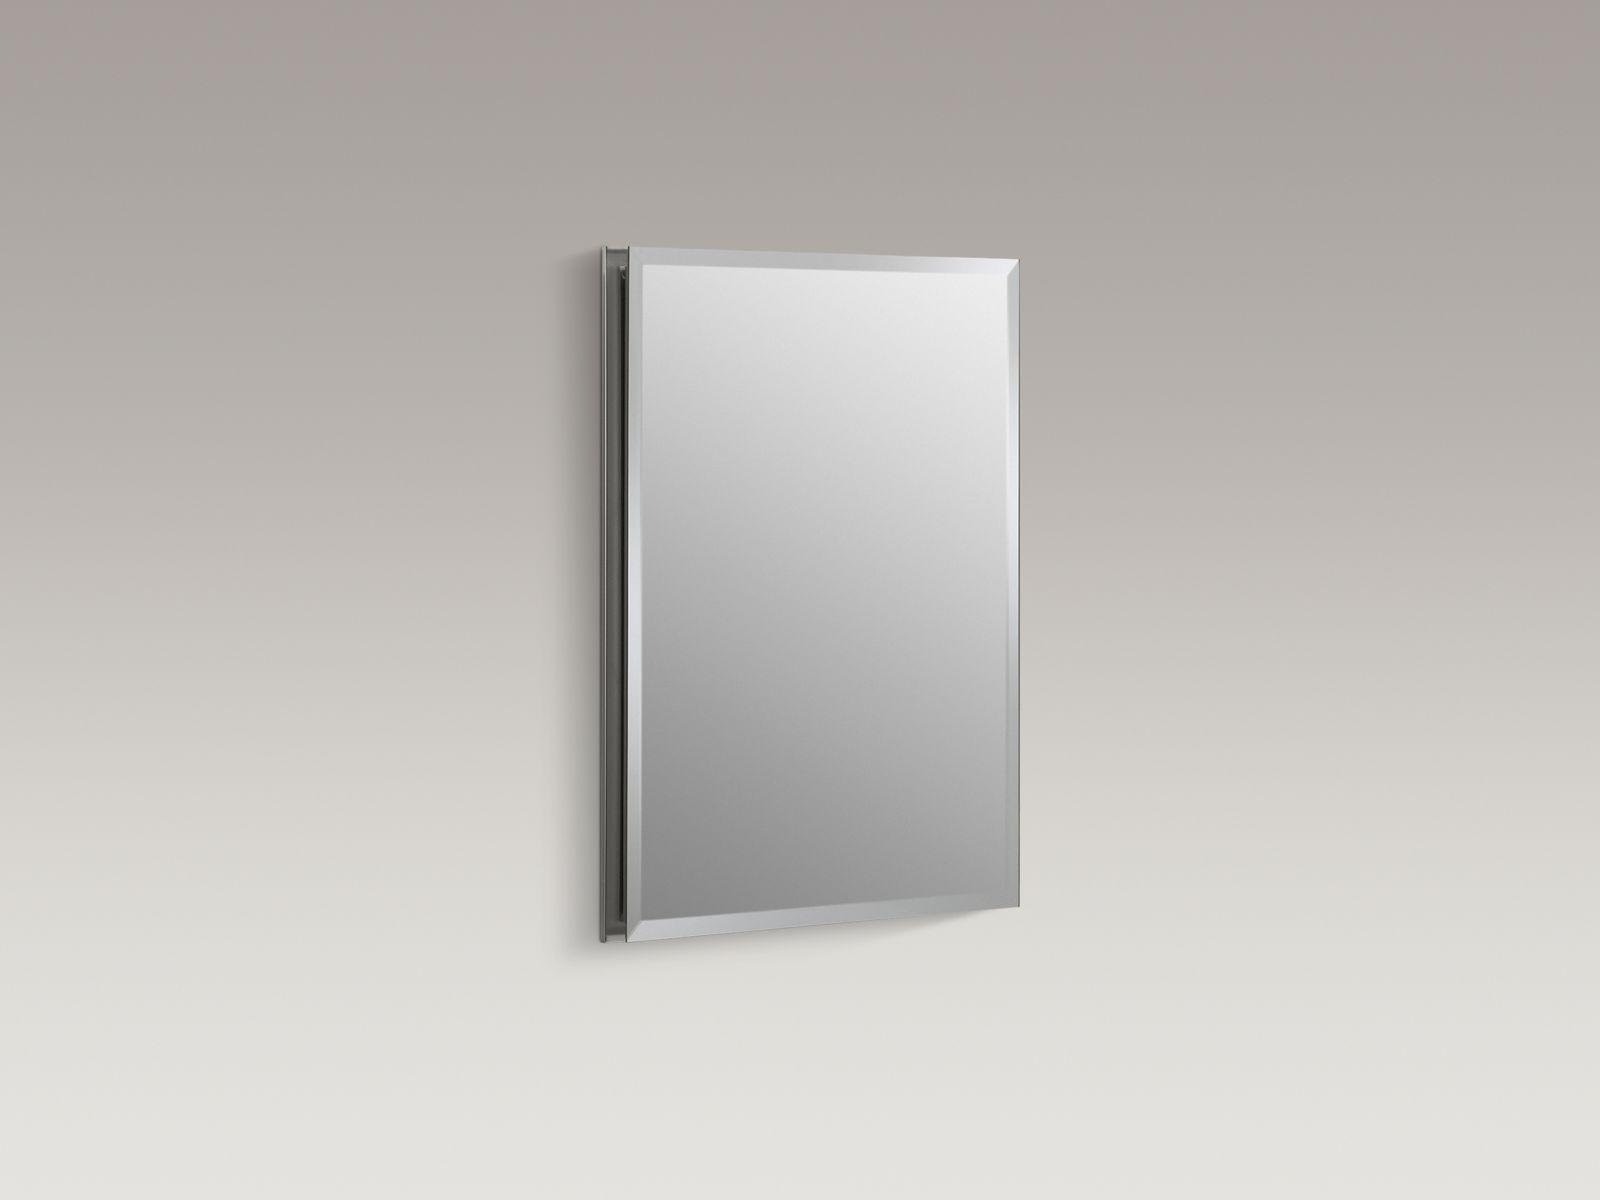 "Kohler K-CB-CLR1620FS Aluminum 16"" x 20"" Single-door Medicine Cabinet with Square Mirrored Door"